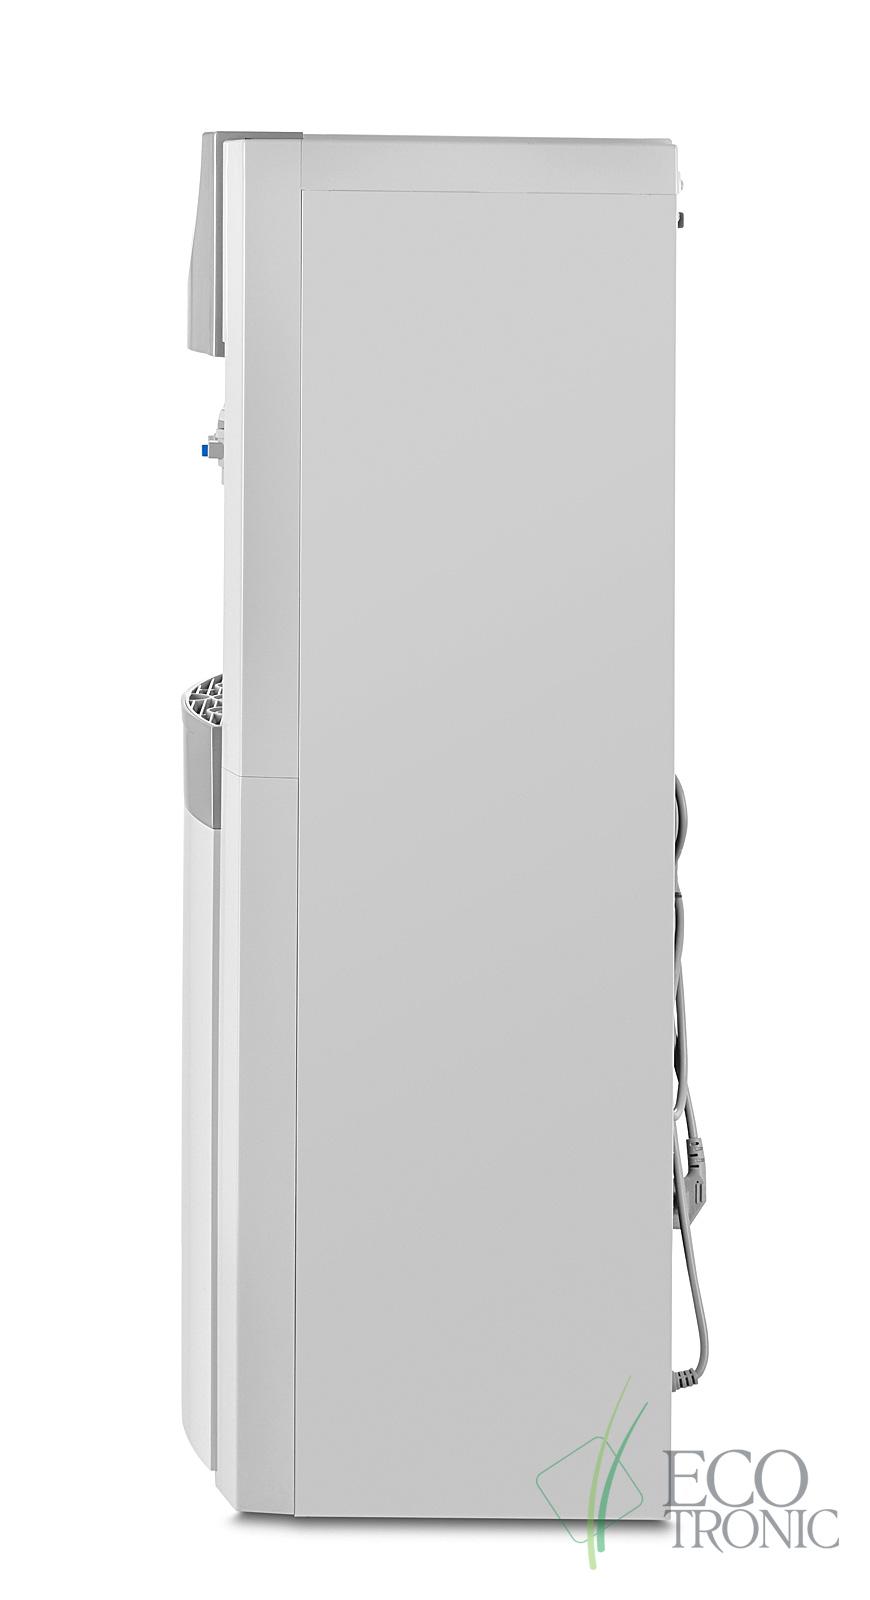 Пурифайер Ecotronic B3-U4LM silver